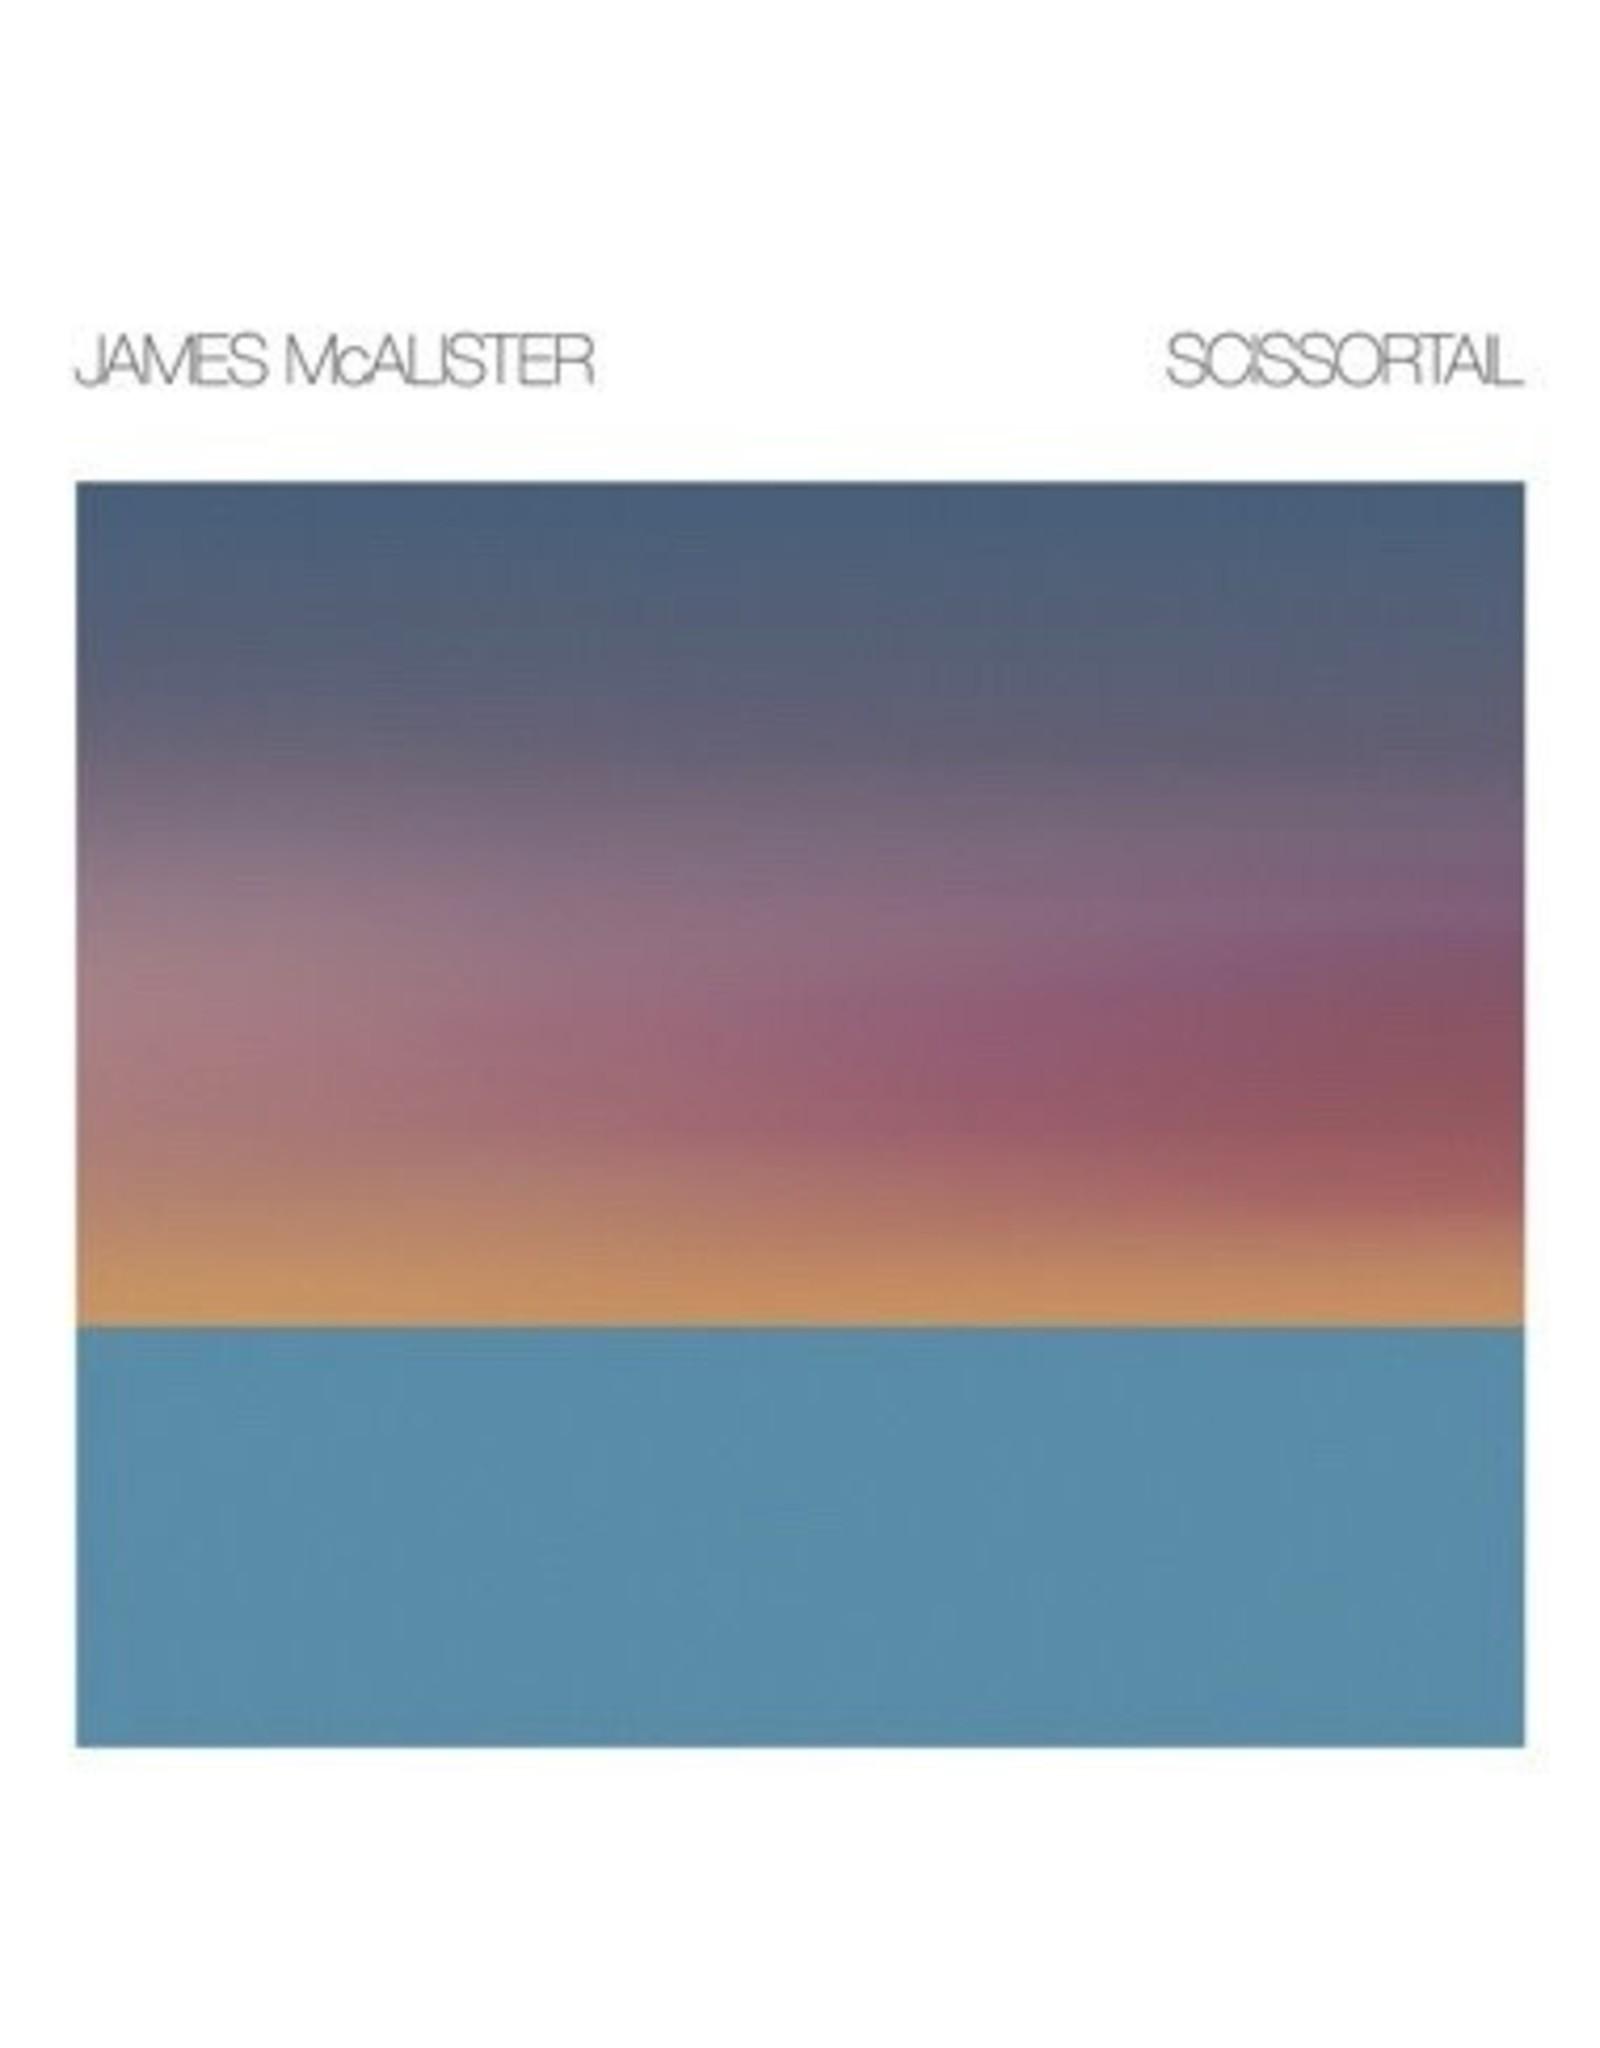 New Vinyl James McAlister - Scissortail LP